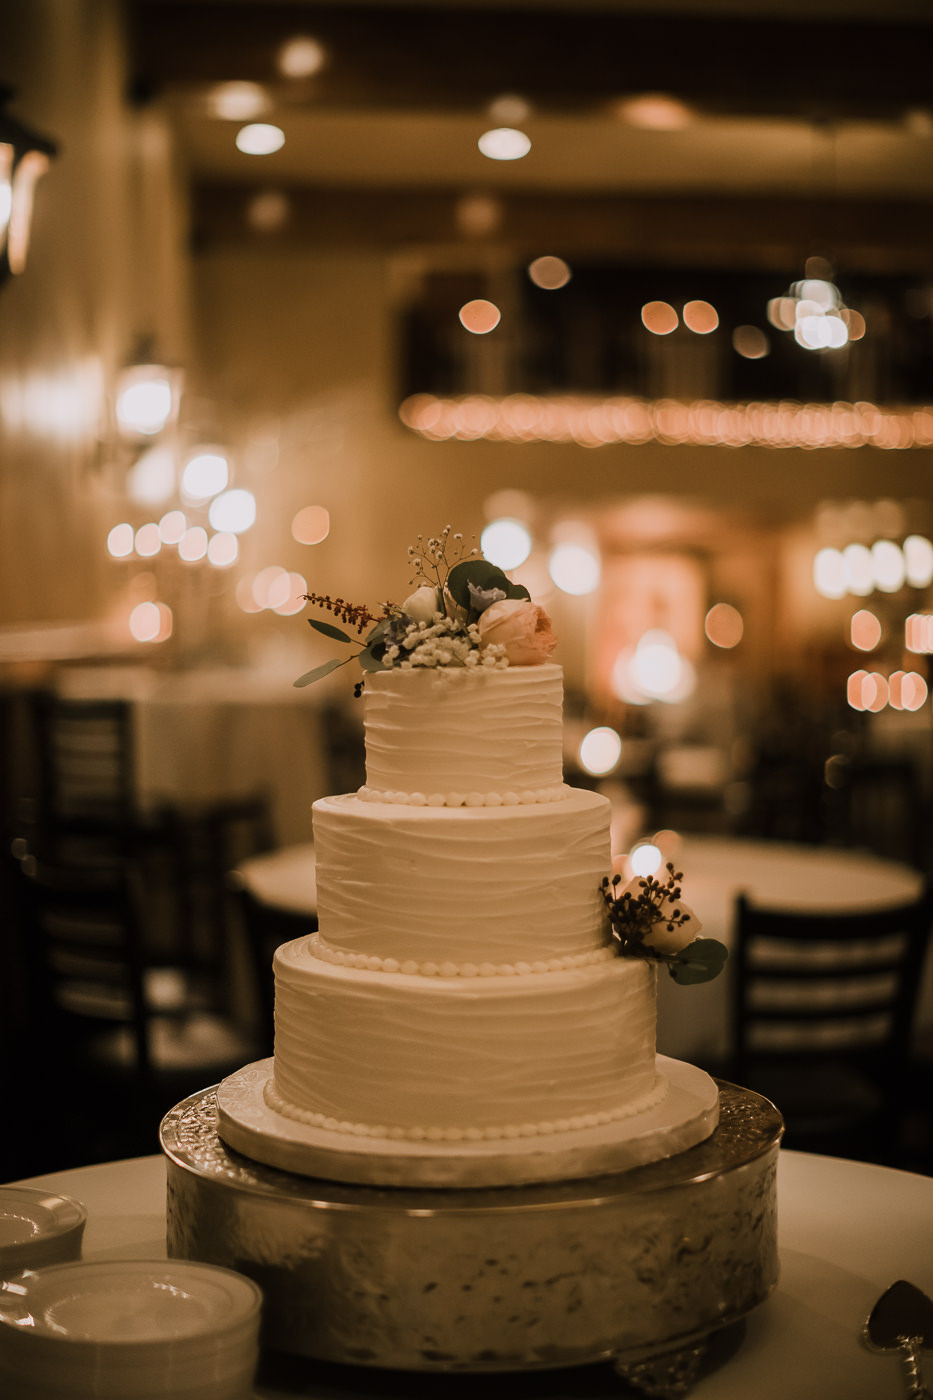 rogers.arkansas.weddingphotos.©2018mileswittboyer-32.jpg